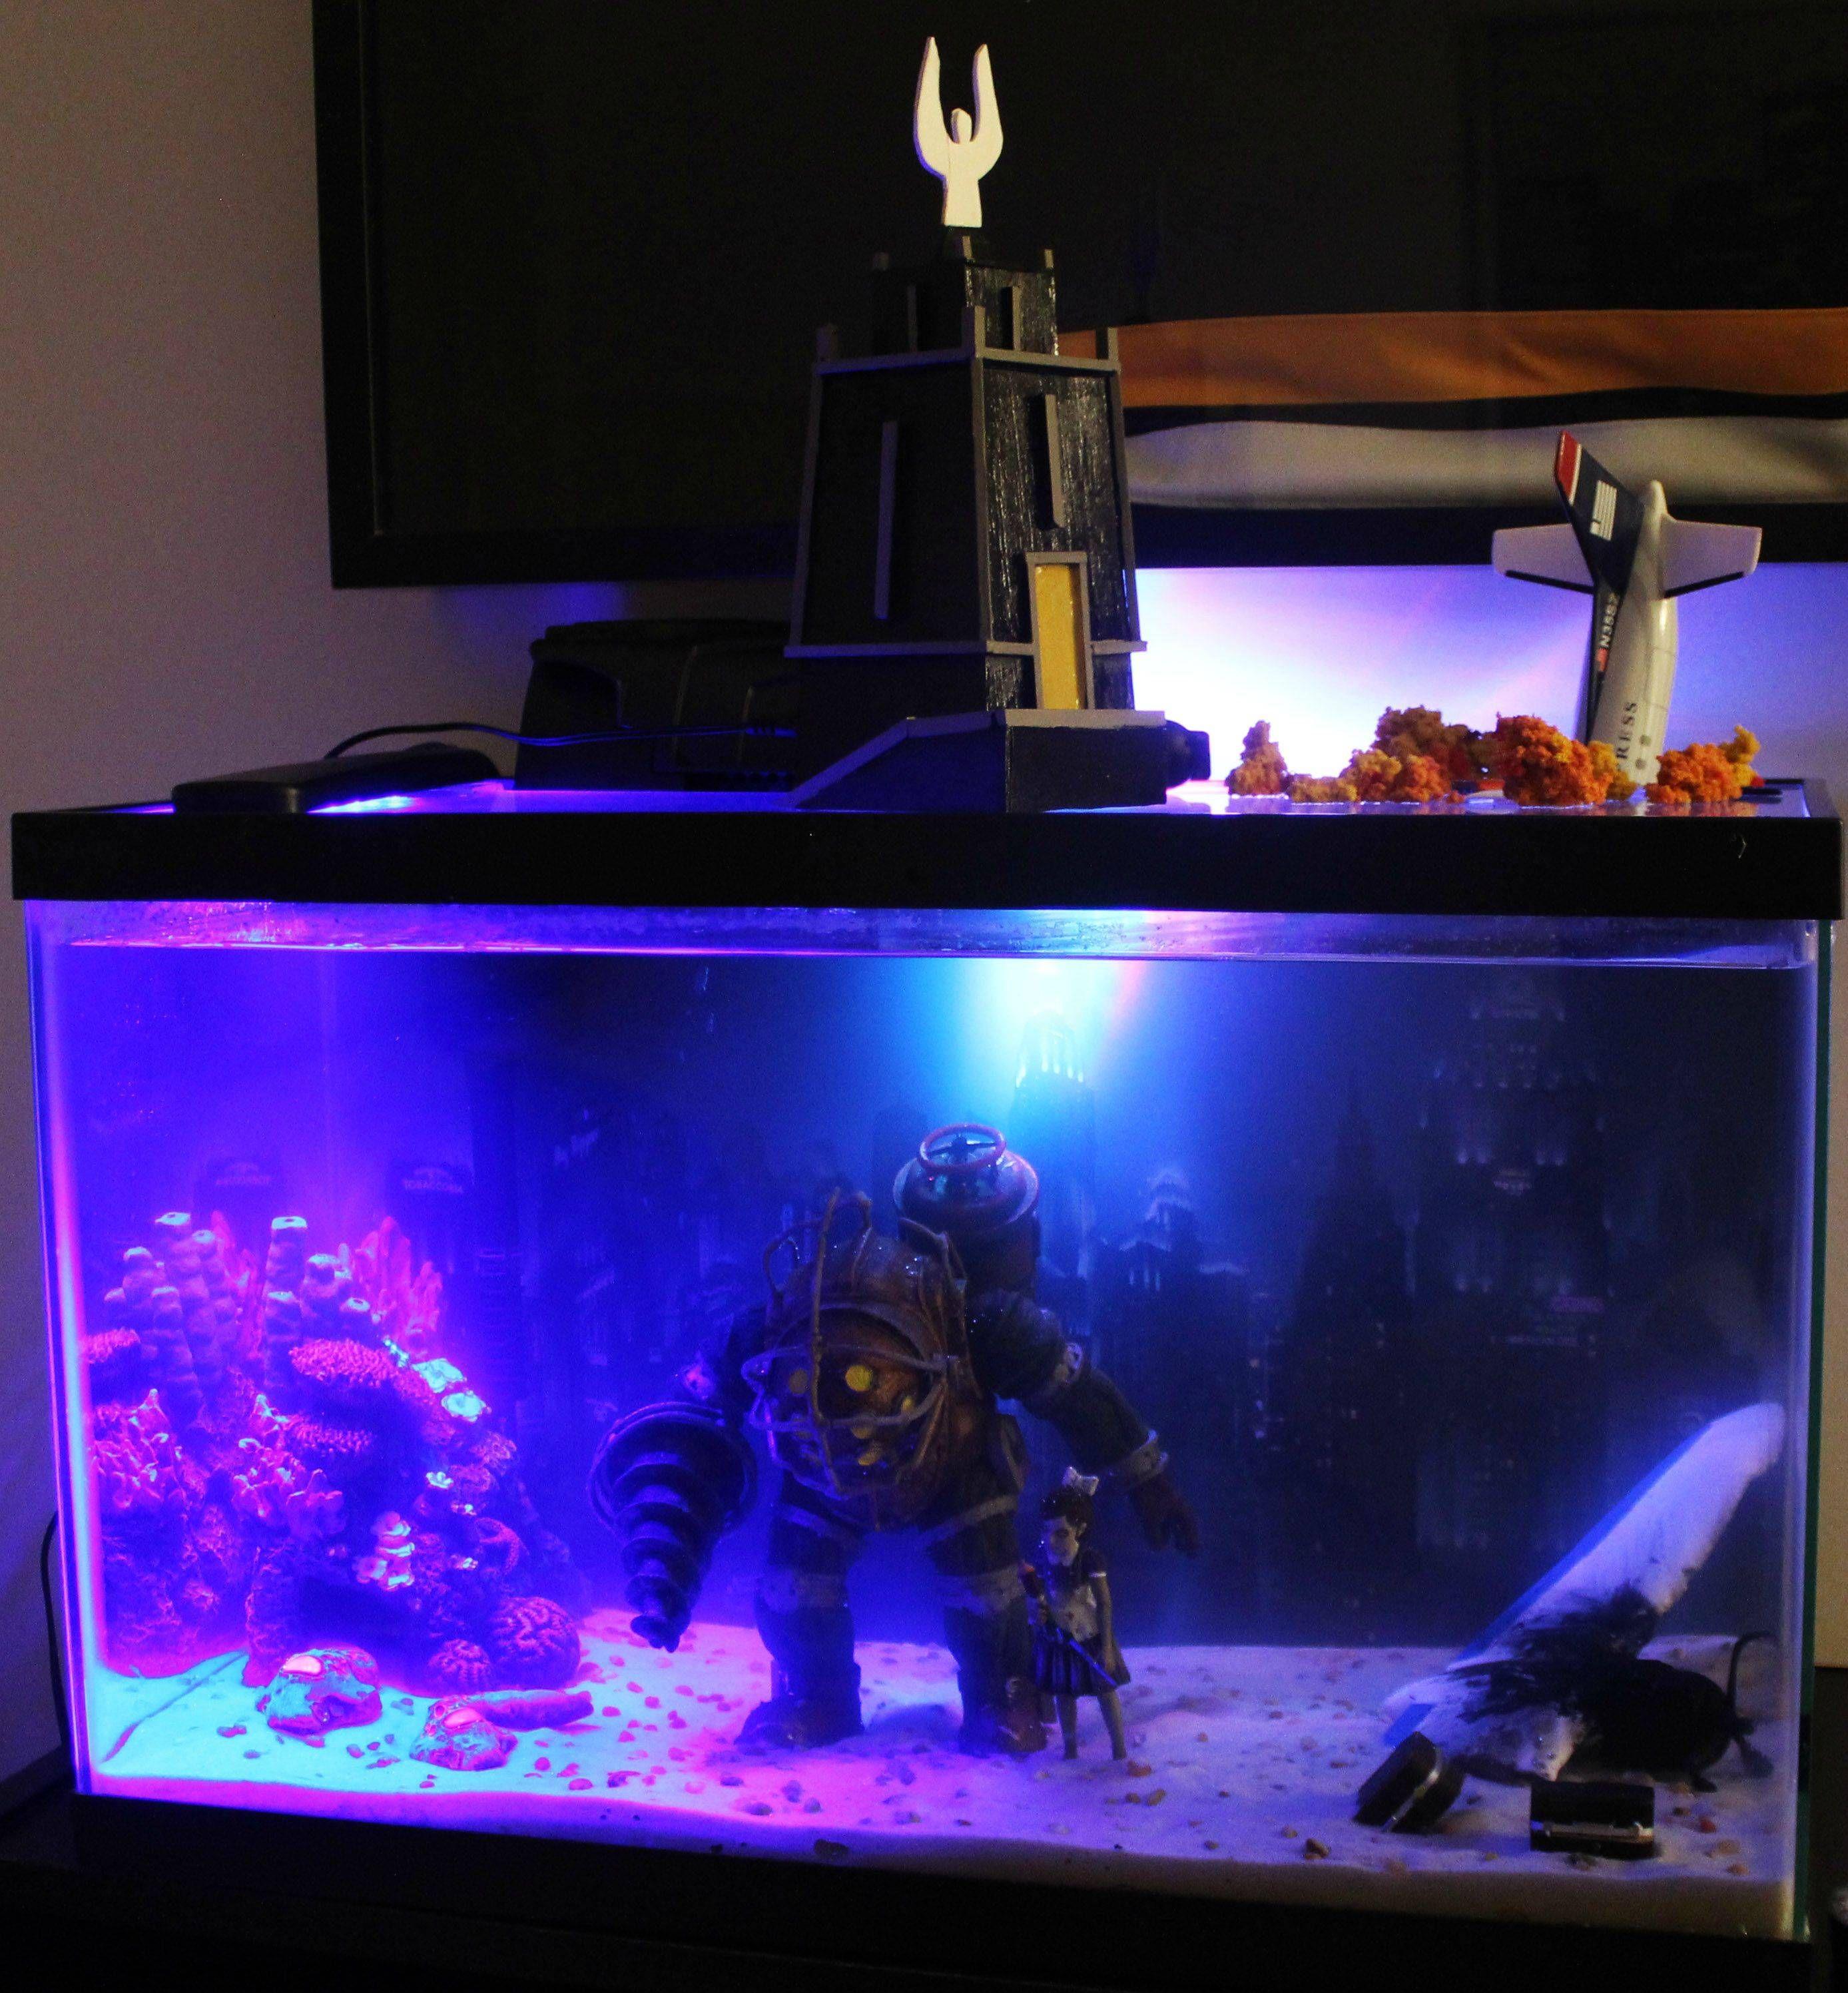 Bioshock Aquarium Fish Tank via Reddit user fryest Fish